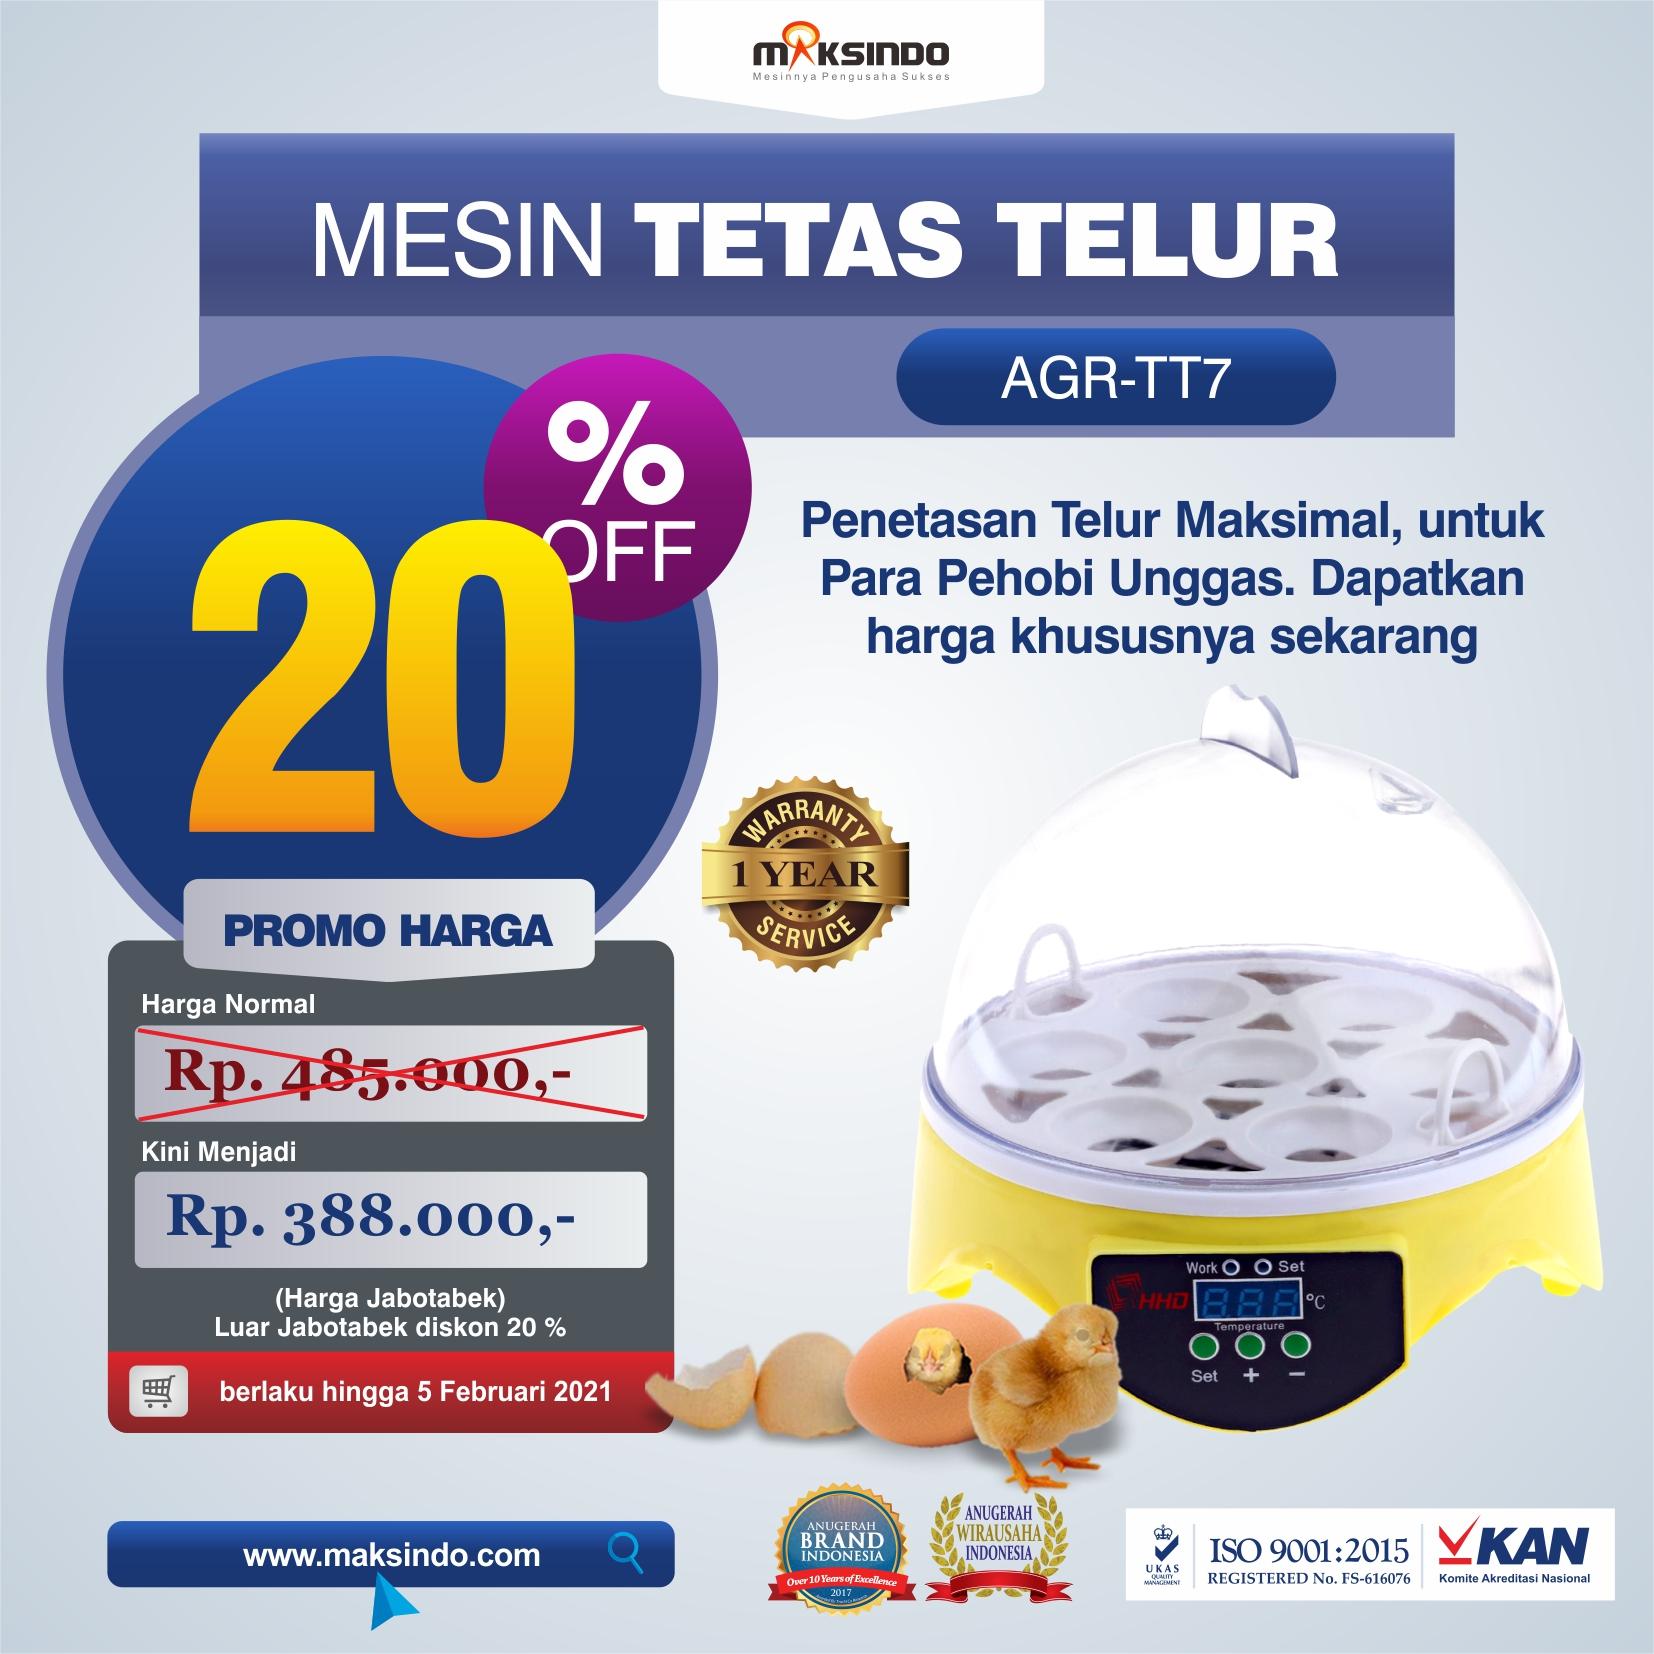 Jual Mesin Penetas Telur 7 Butir di Semarang